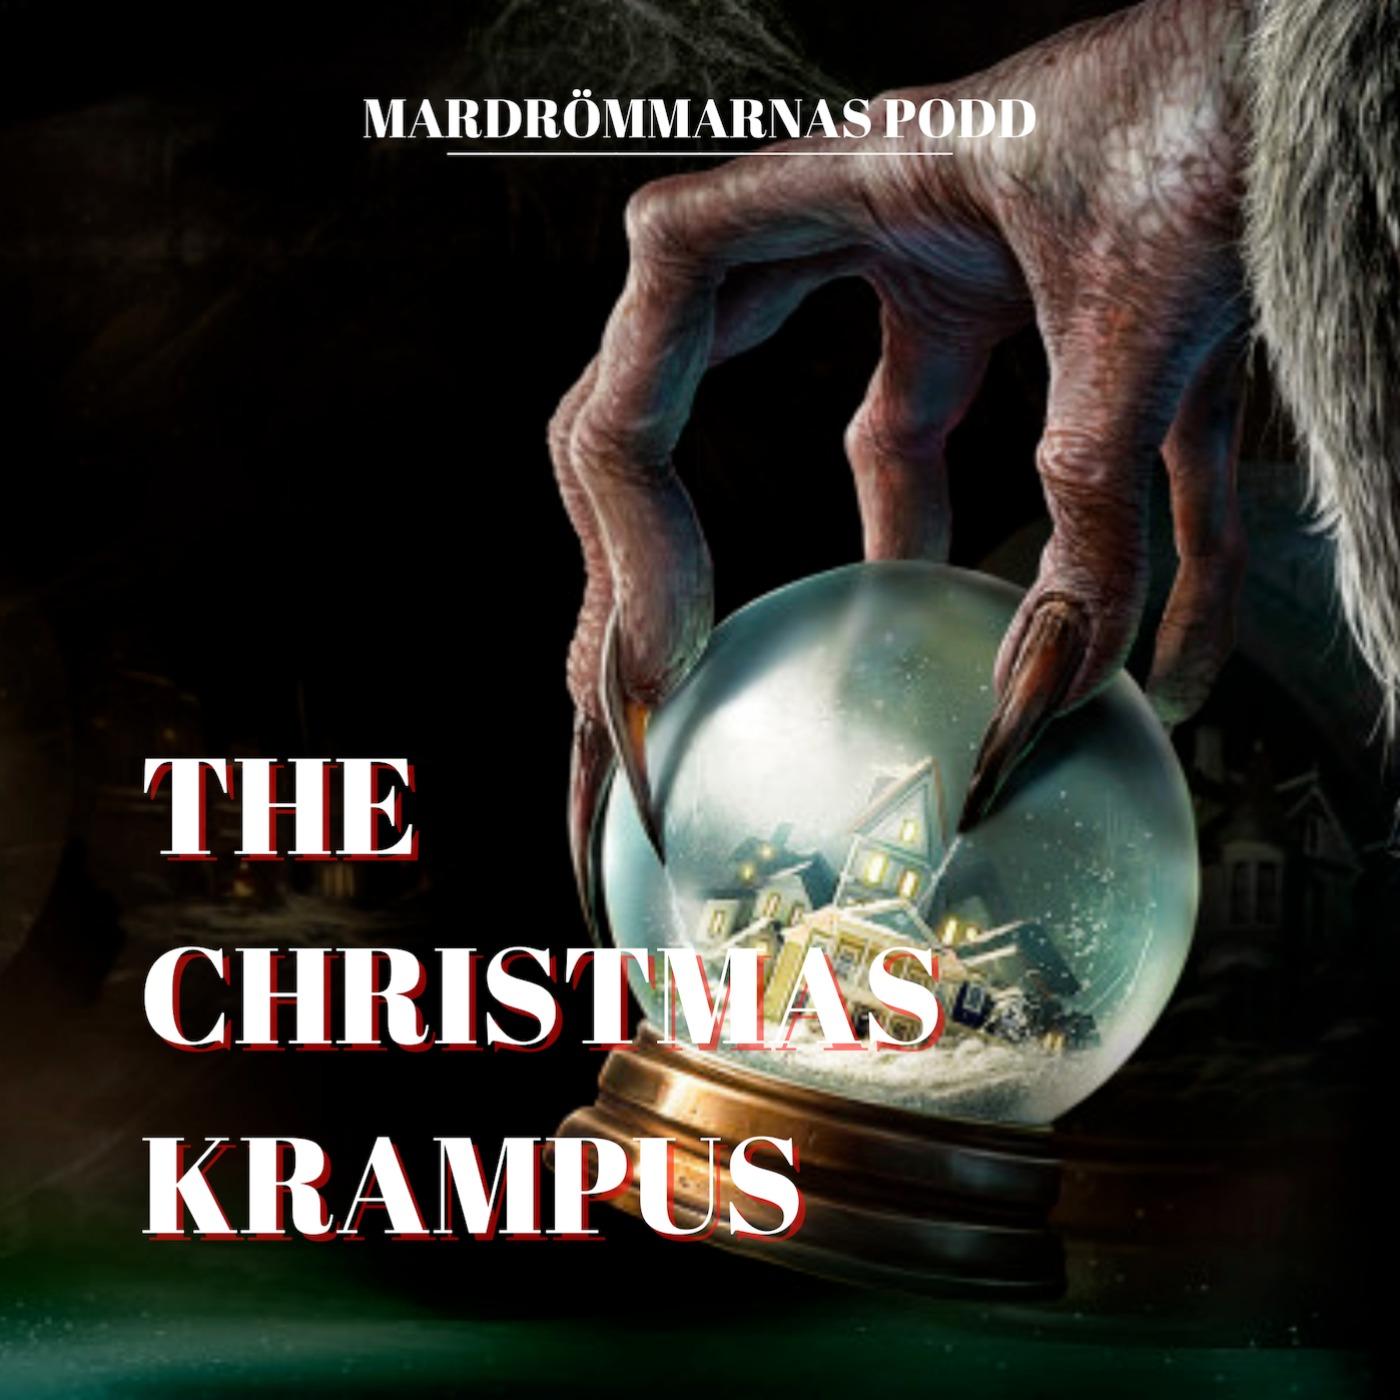 Extra - The christmas krampus